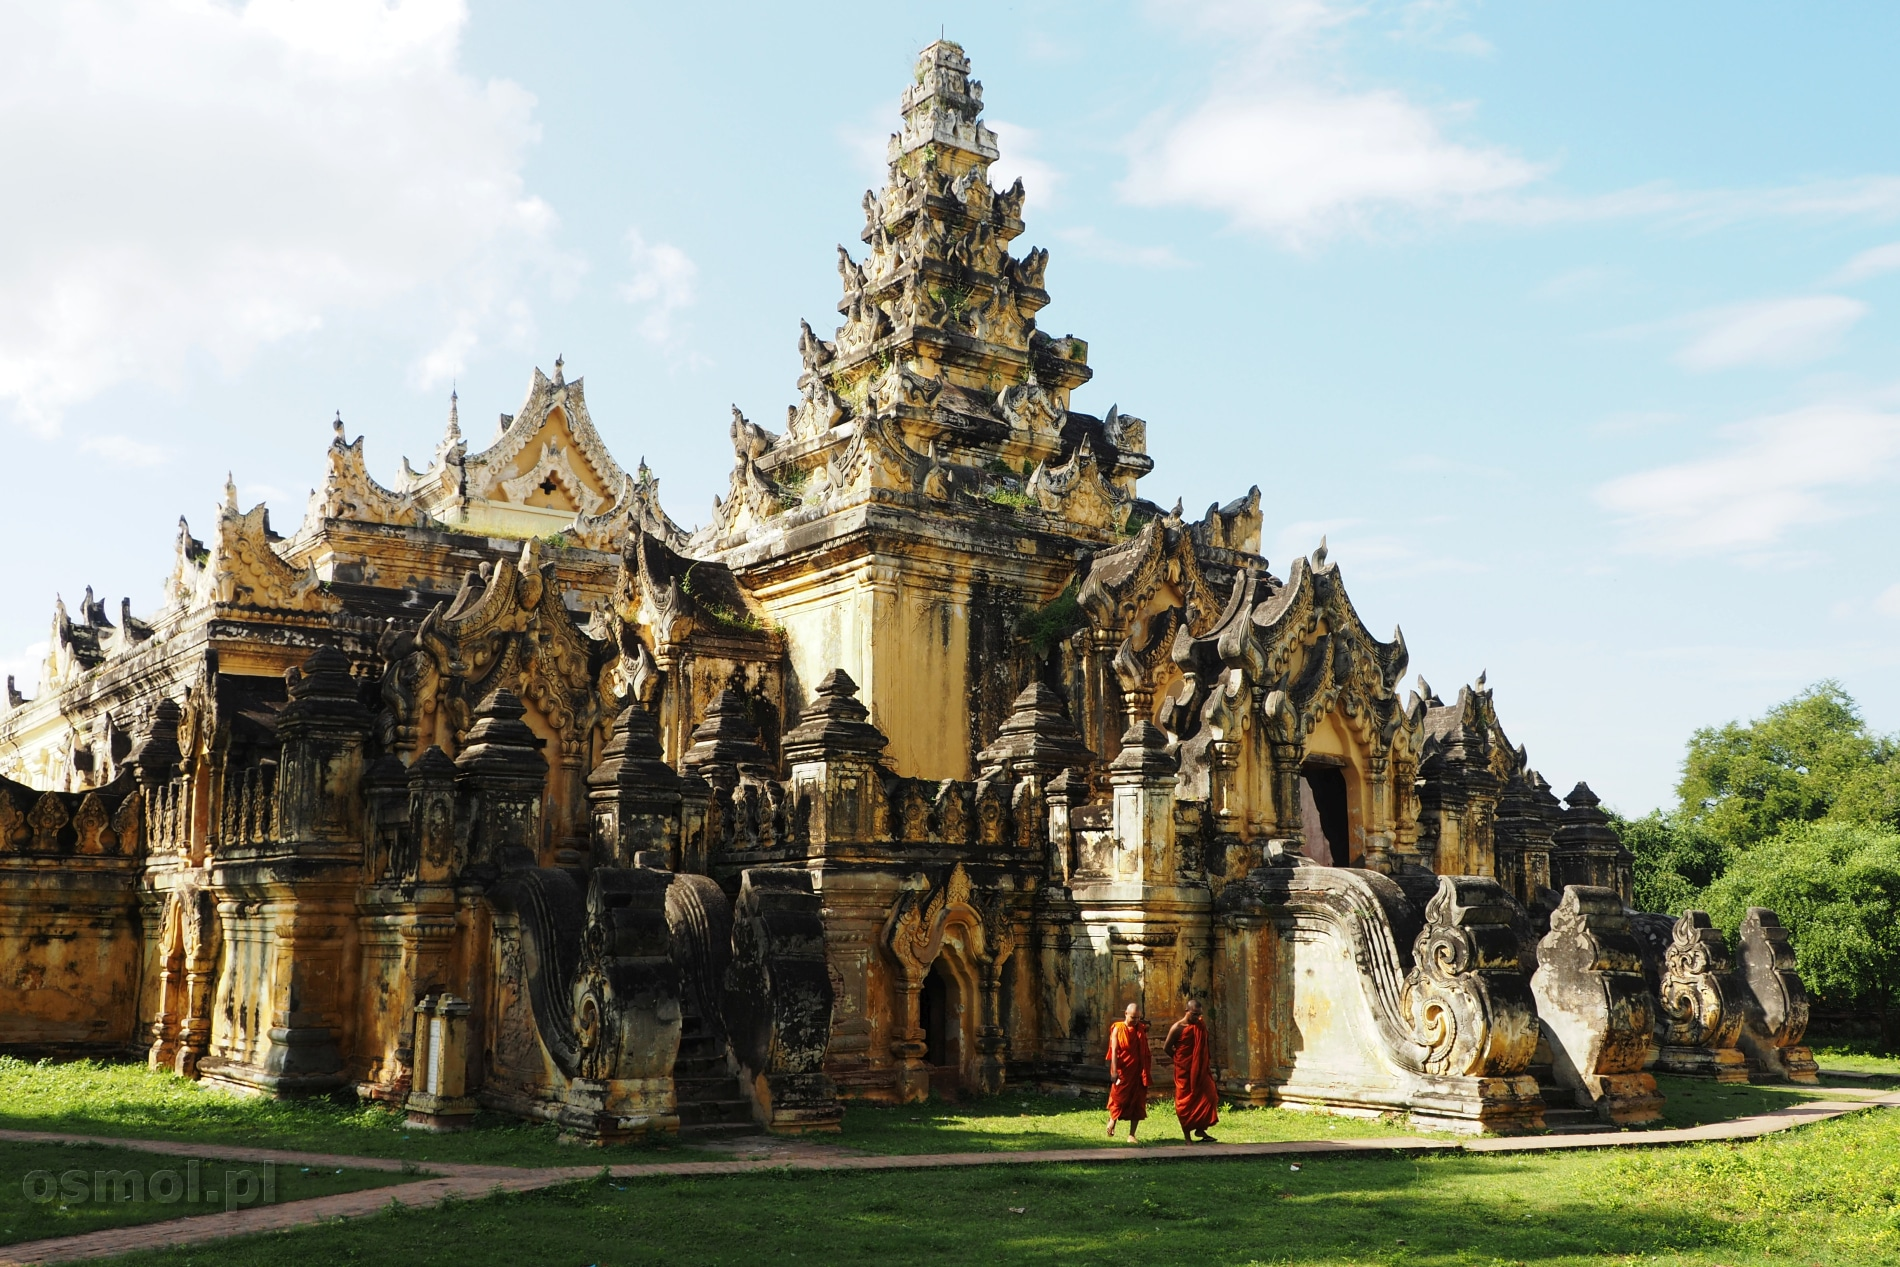 Klasztor Maha Aung Mye Bonzan w Inwie